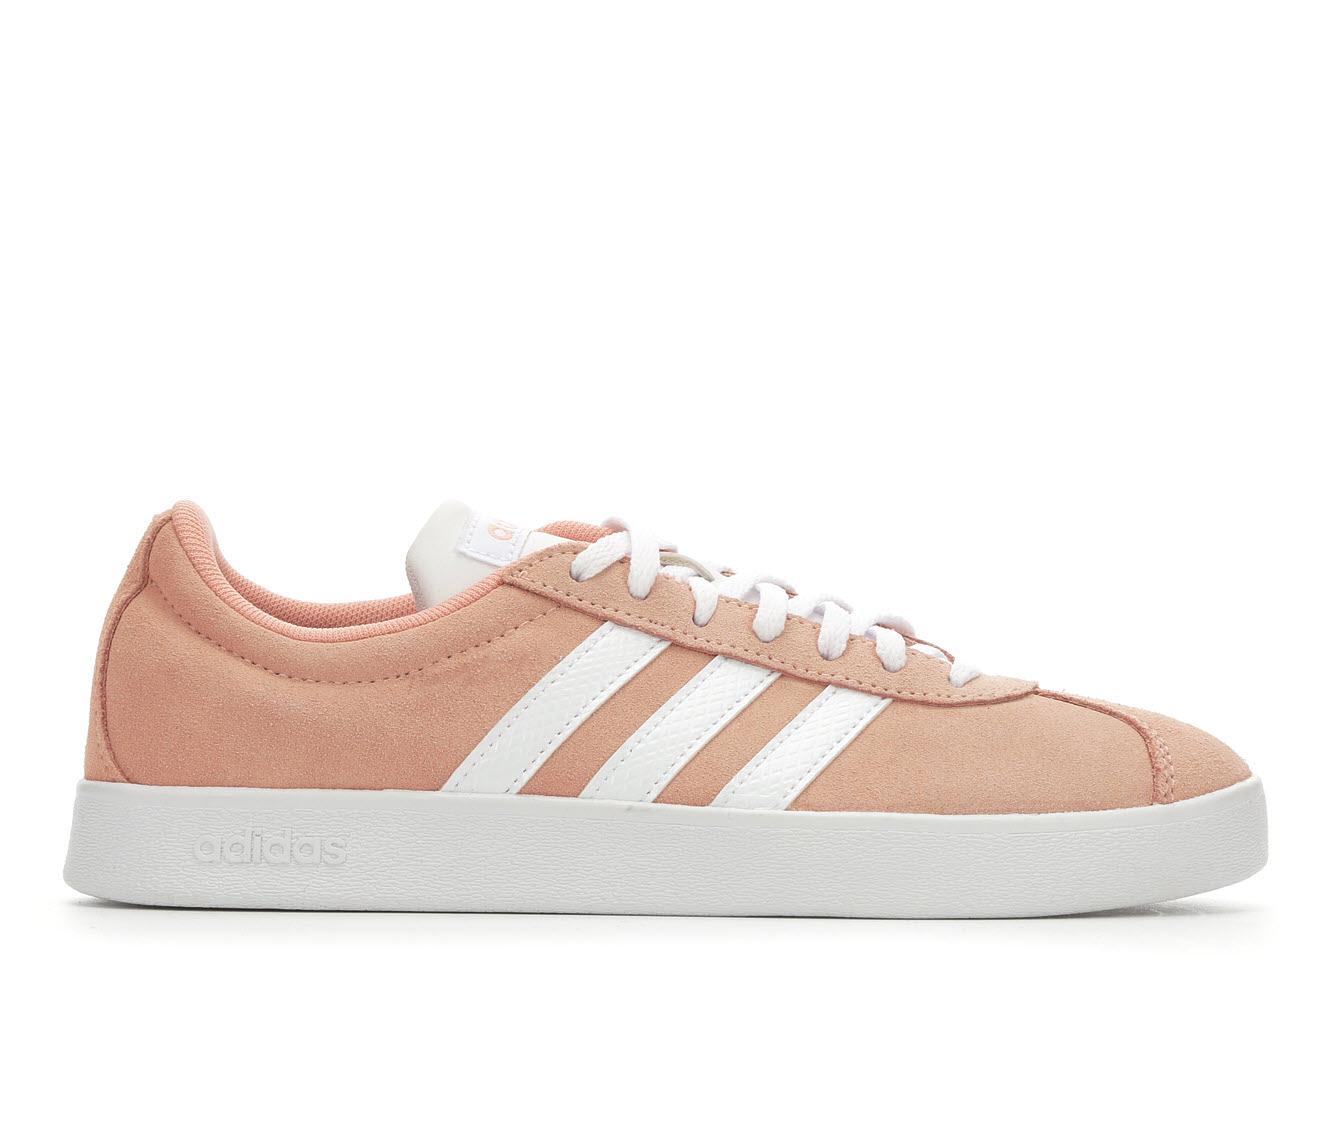 Adidas VL Court 2.0 Women's Athletic Shoe (Pink)